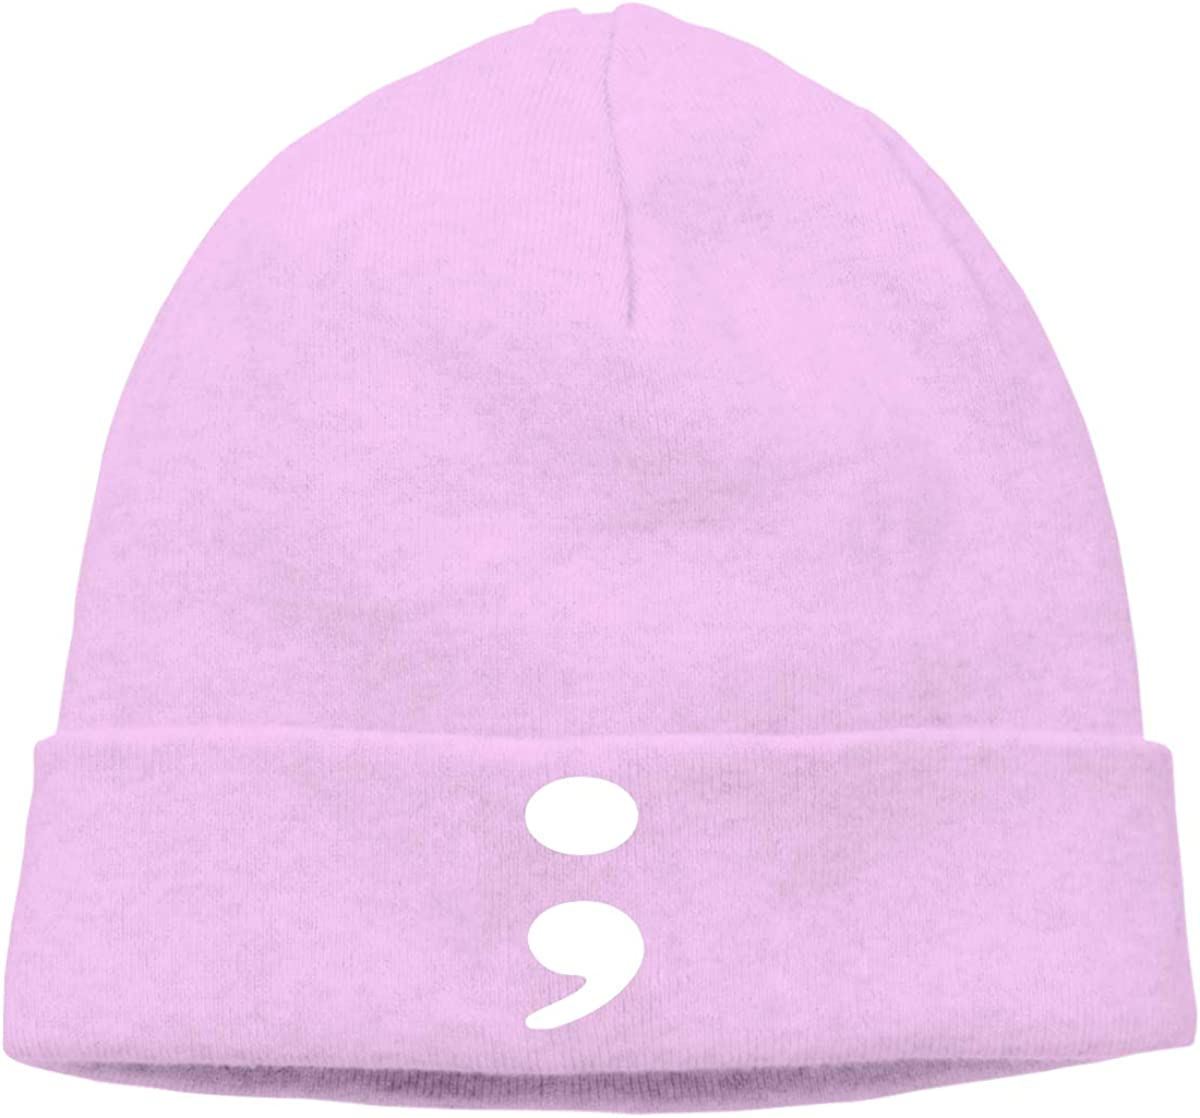 WWGSFSDHTTM Colon Warm Hat Baggy Slouchy Beanie Hat Skull Cap